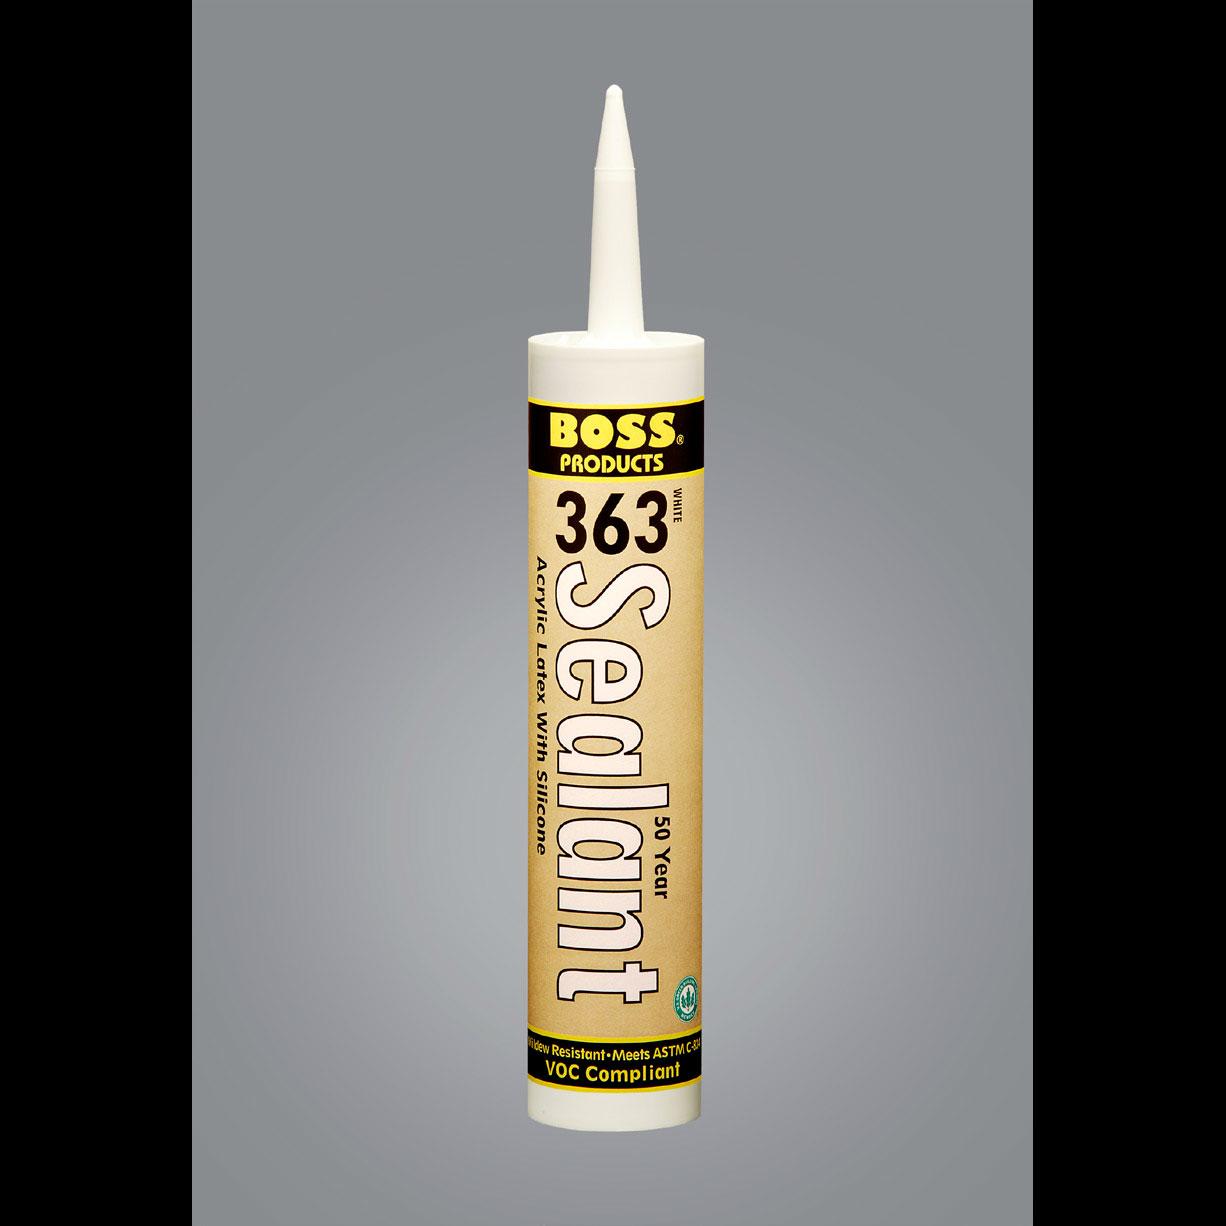 Boss 363 50 Year Silicone Caulk General Insulation